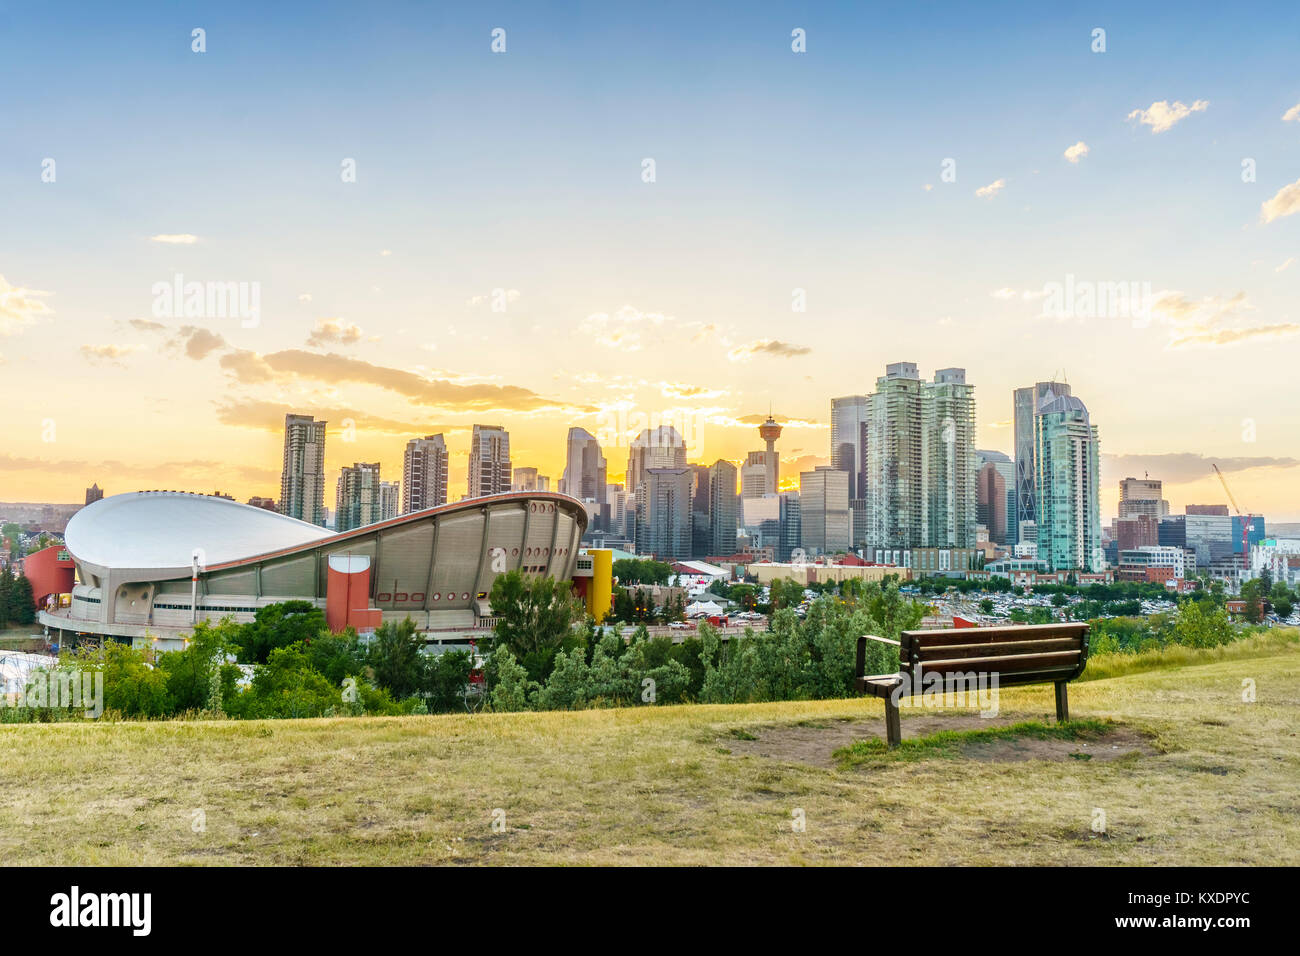 Die Innenstadt von Calgary bei Sonnenuntergang im Sommer, Alberta, Kanada Stockbild